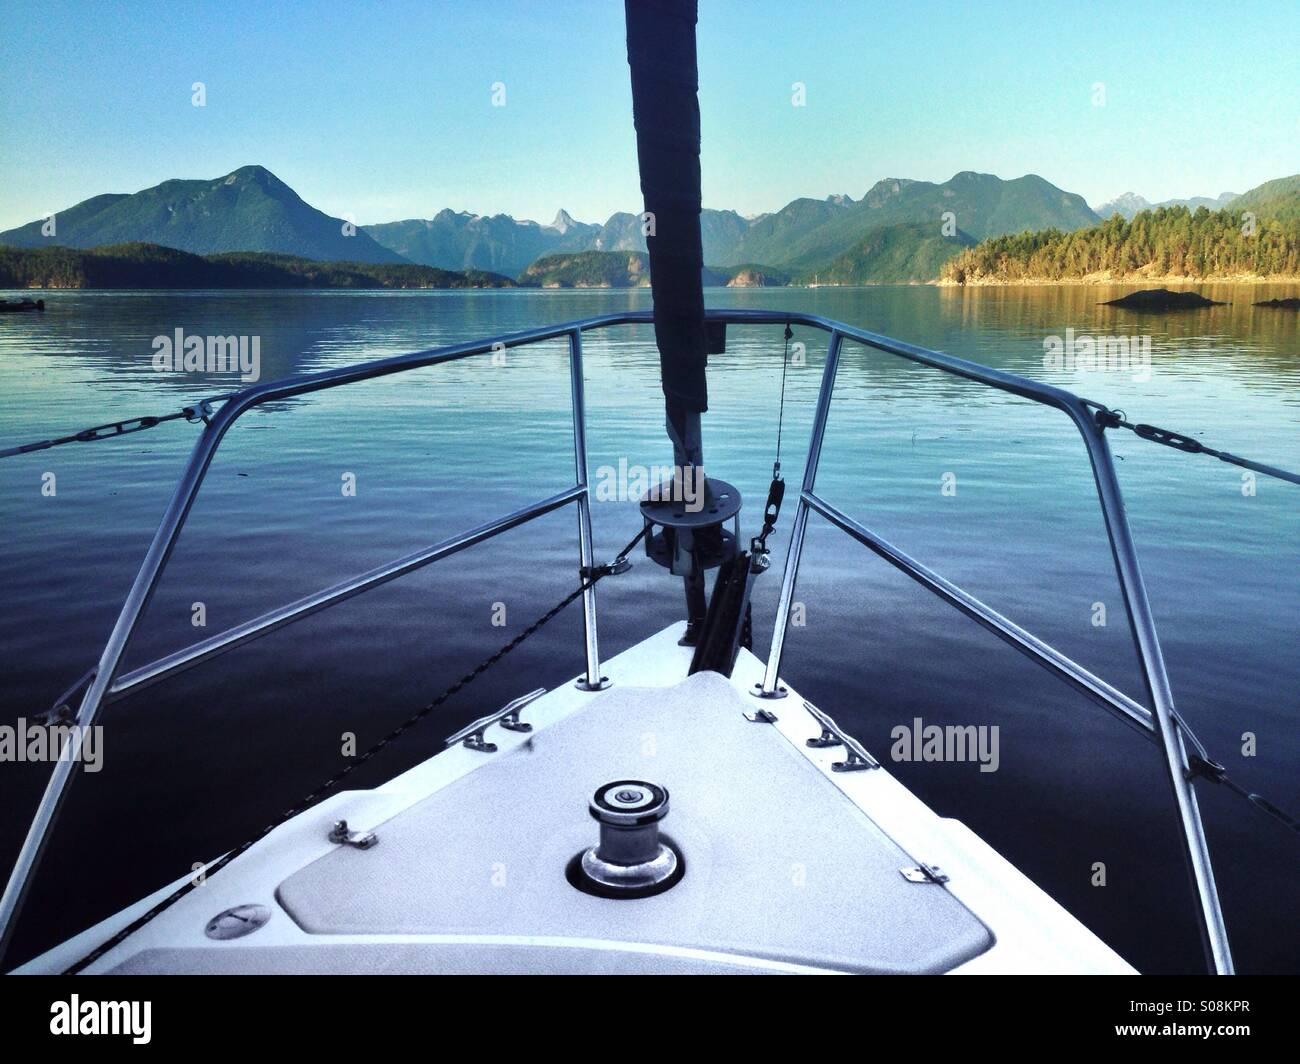 Evening at Galley Bay, Desolation Sound, BC - Stock Image